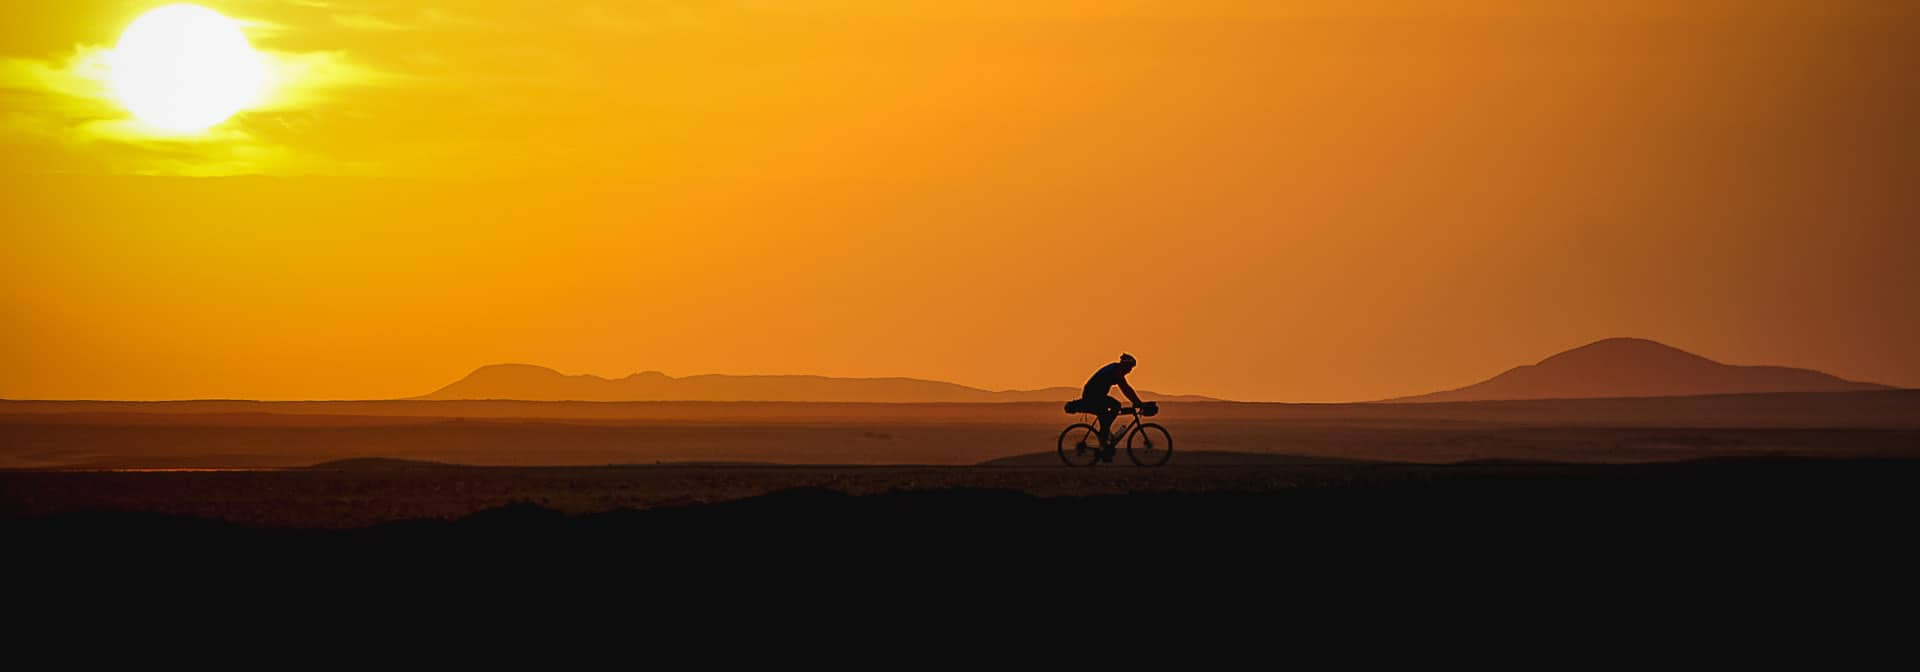 sam-africa-panorama-cycles